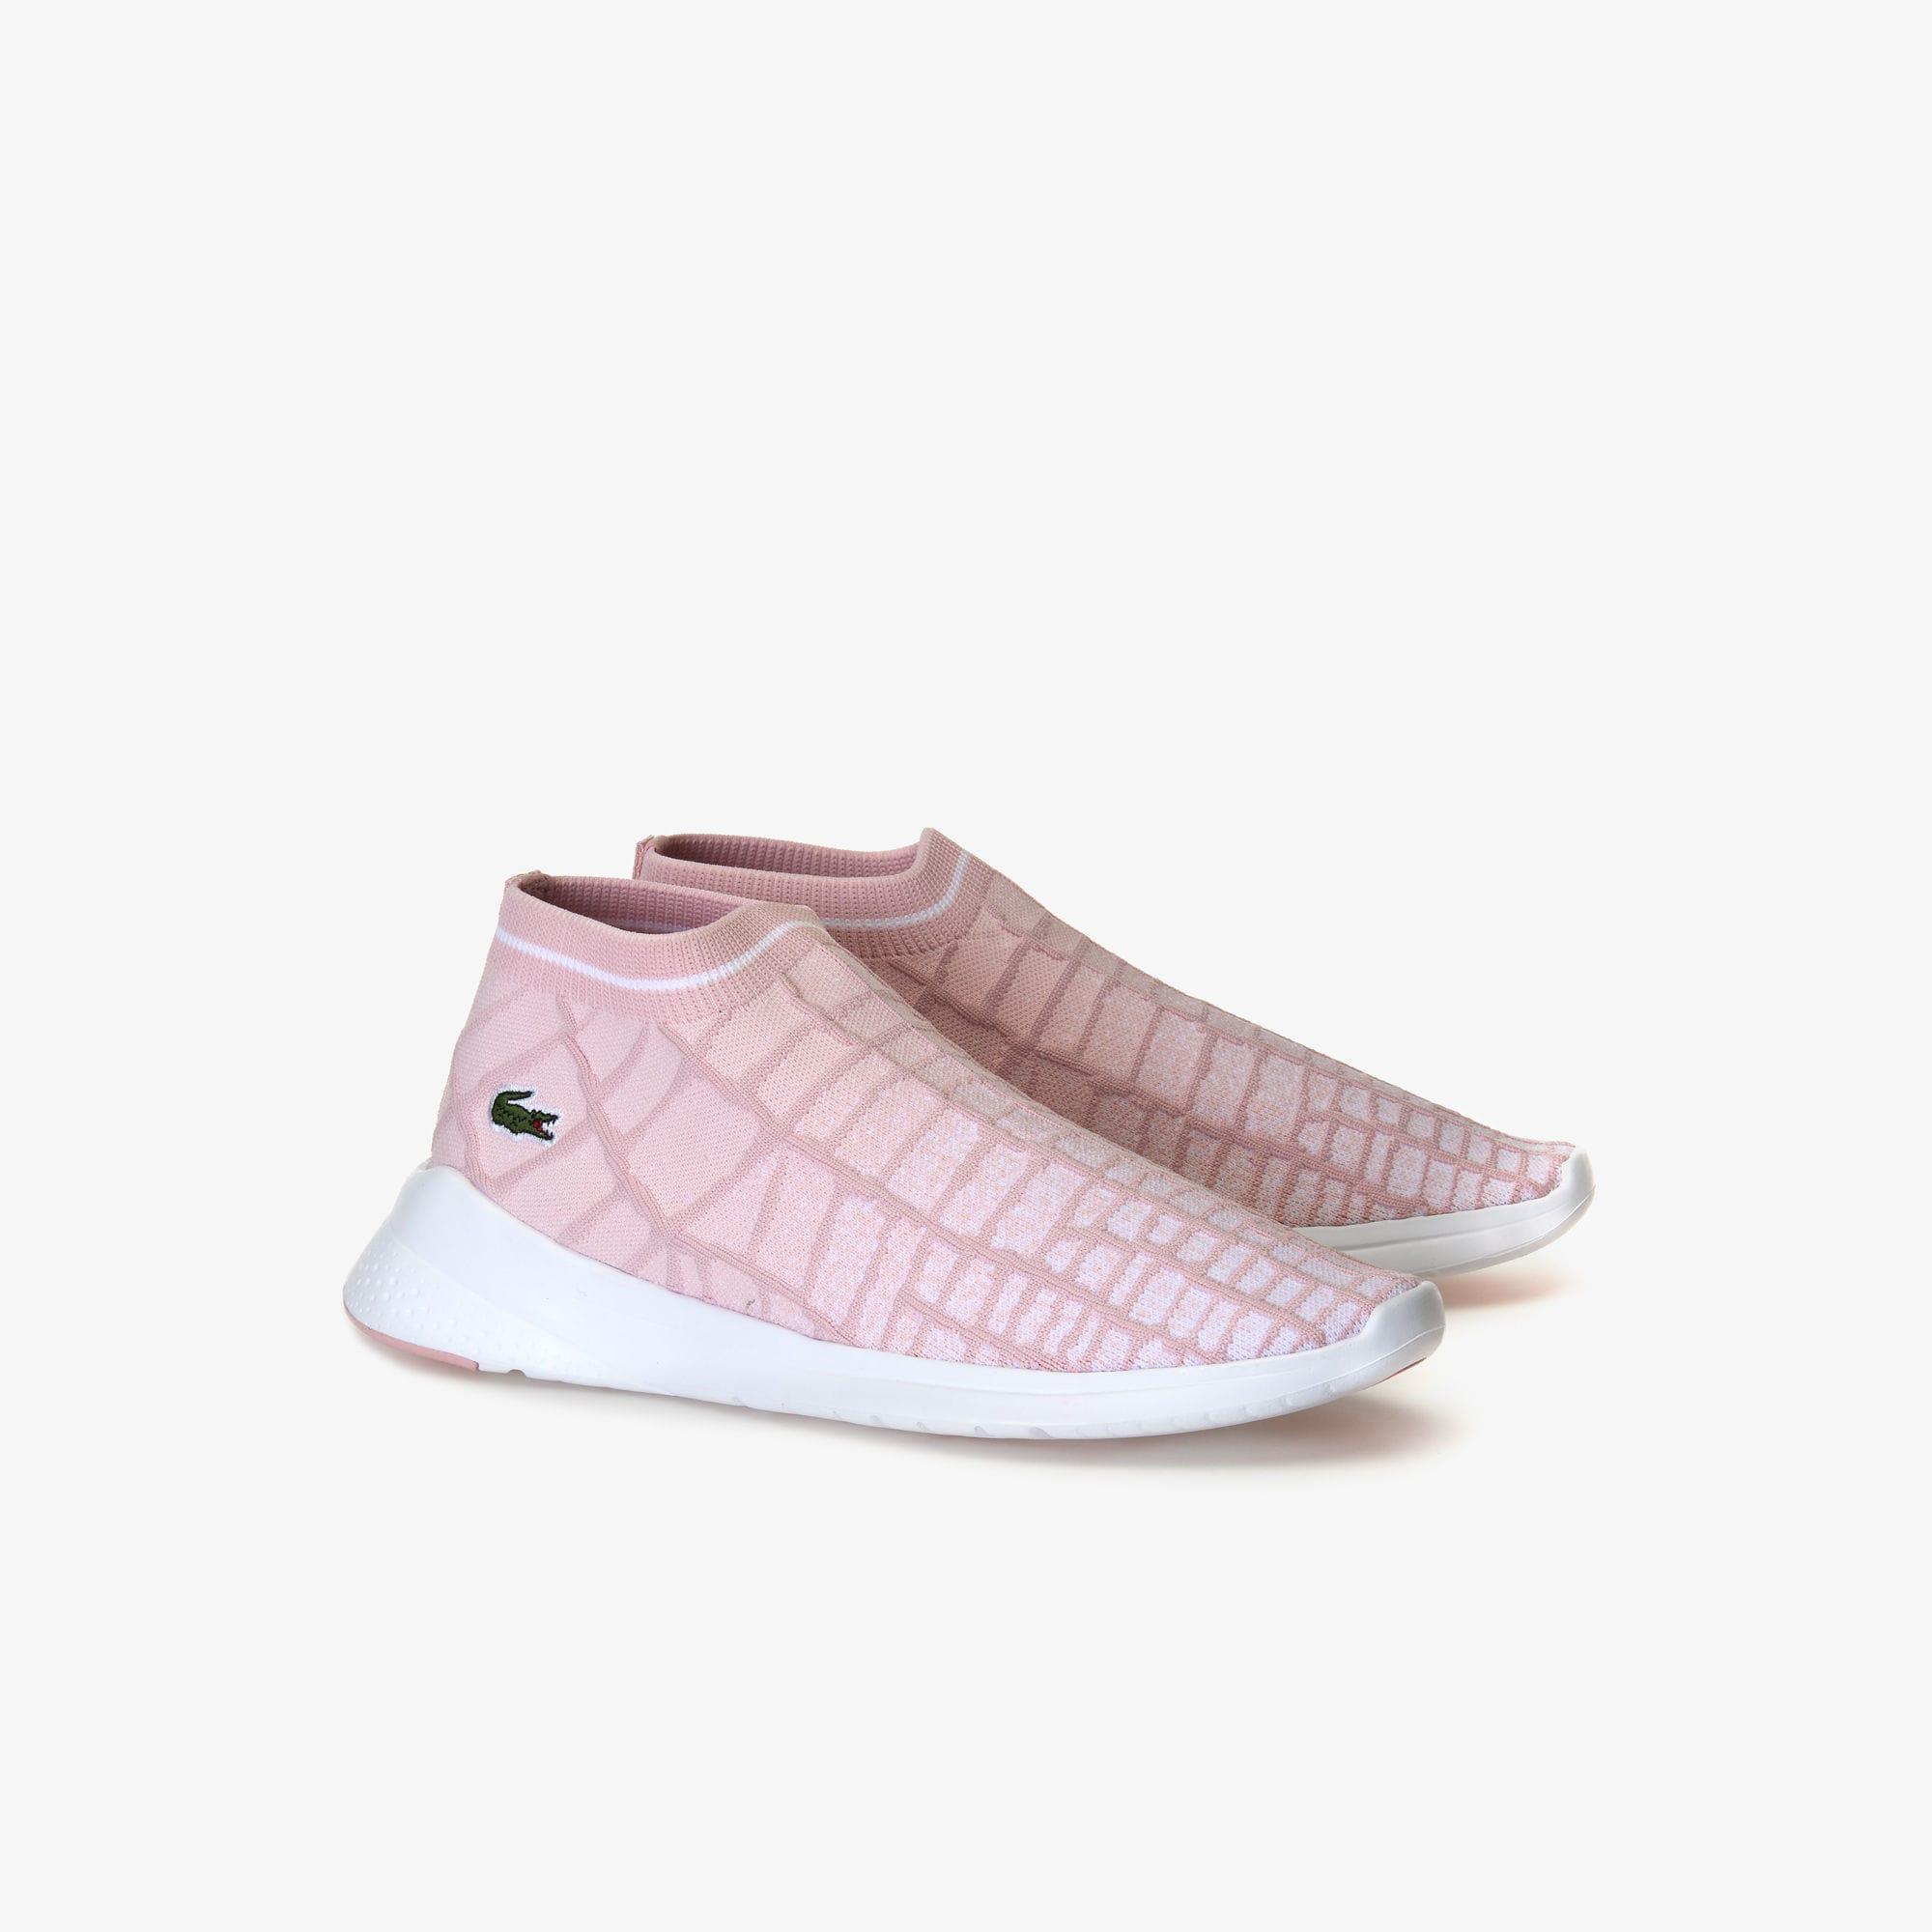 Lacoste Lt Fit Sock Textile Sneakers in